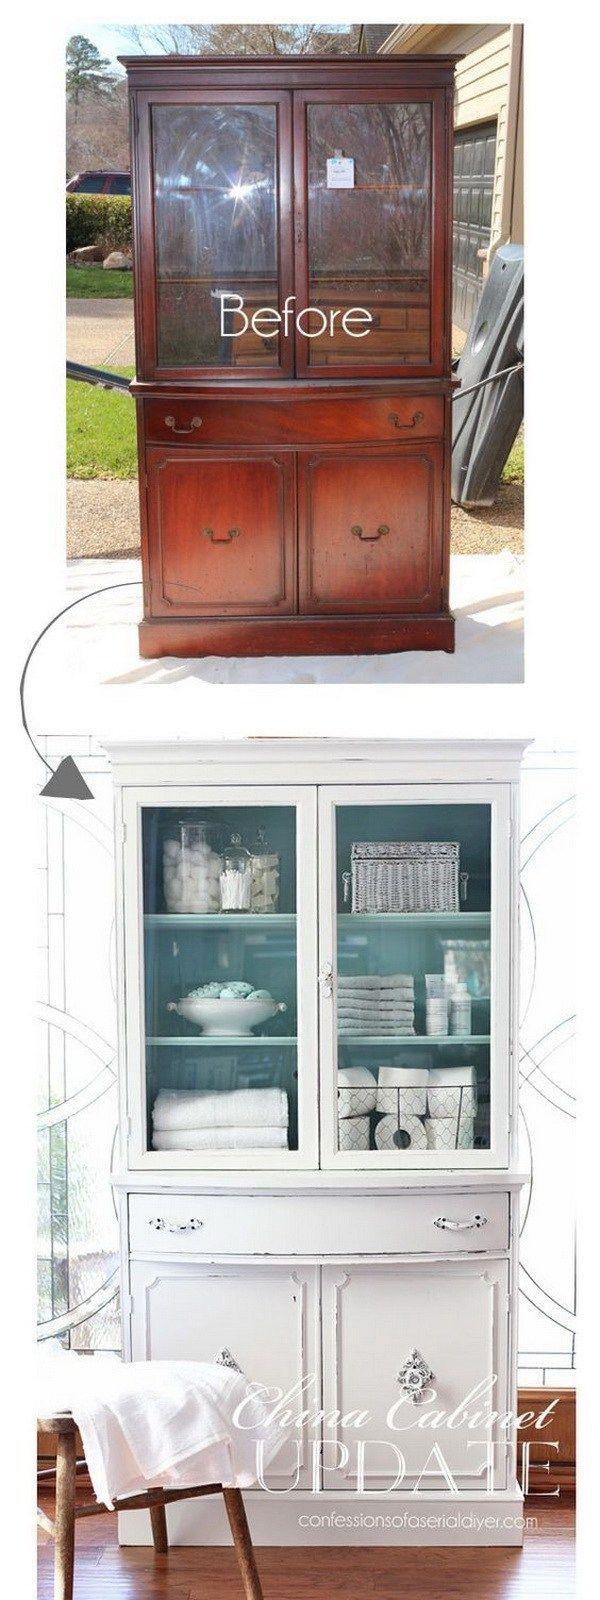 Mejores 3708 Im Genes De Shabby Chic Furniture En Pinterest  # Muebles Gastados